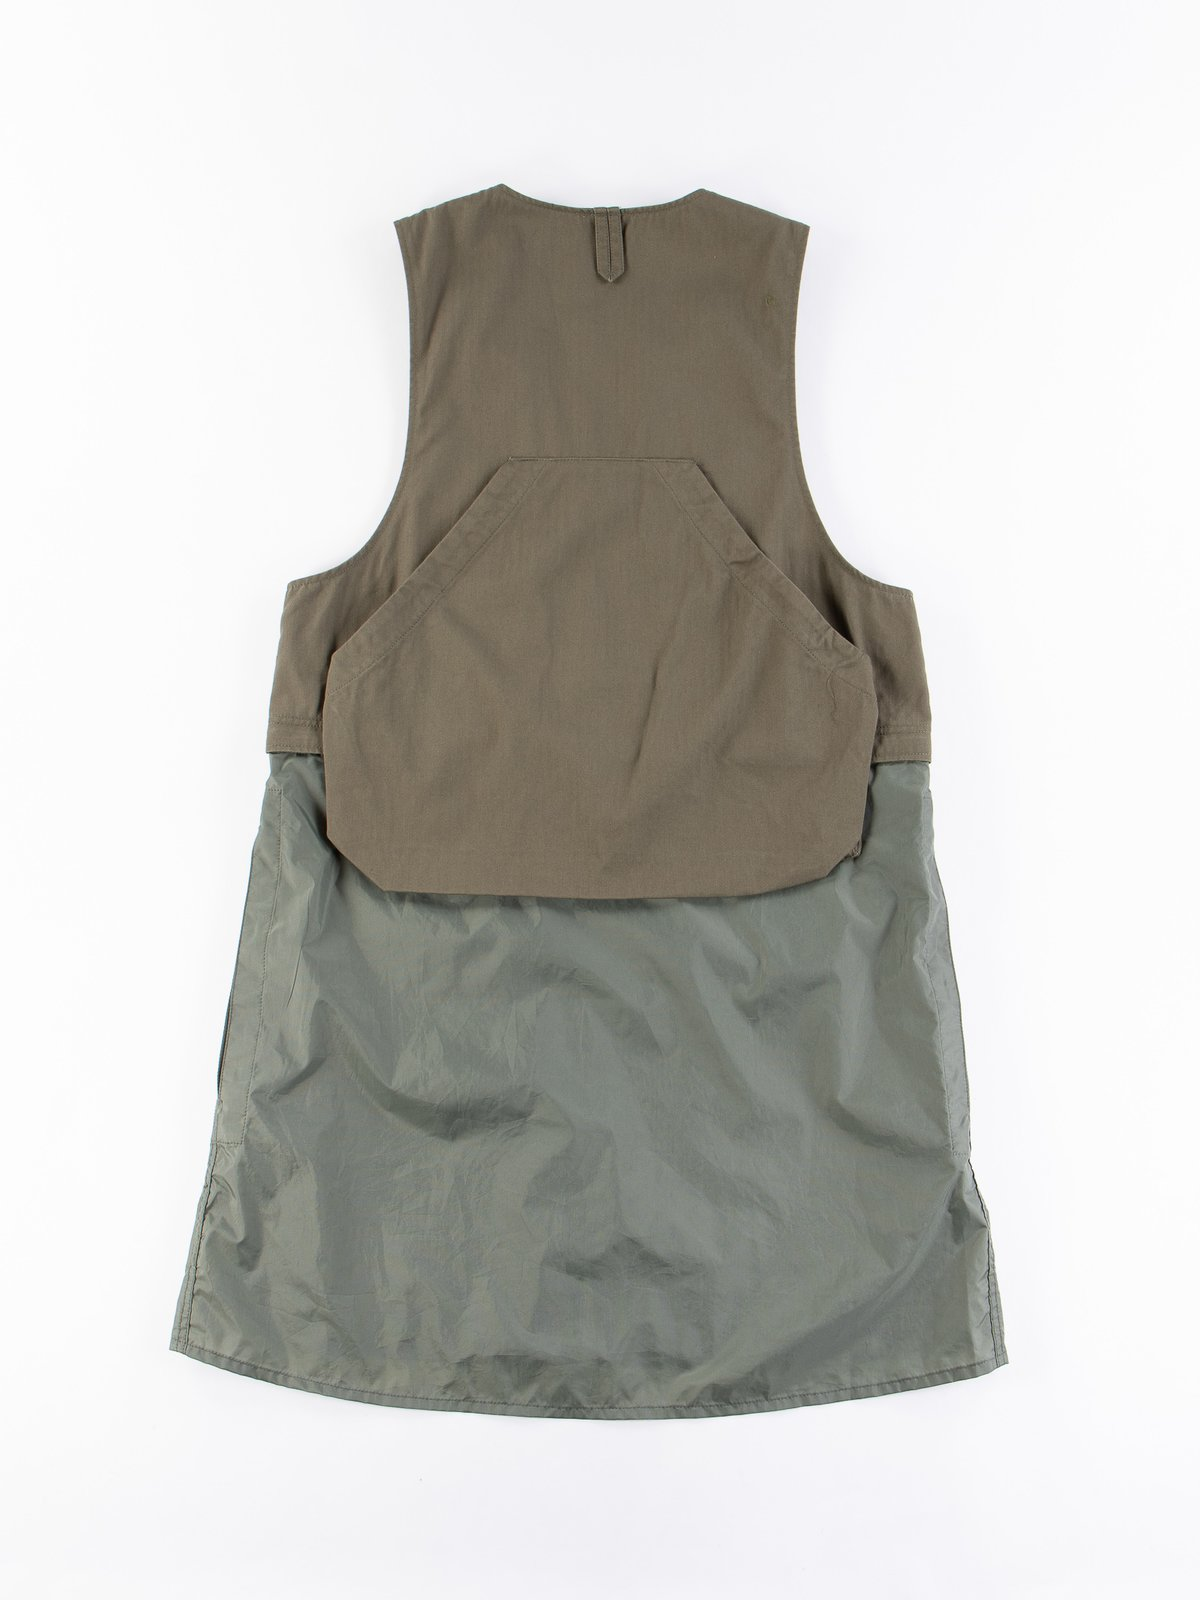 Olive Cotton Herringbone Twill Long Fowl Vest - Image 7